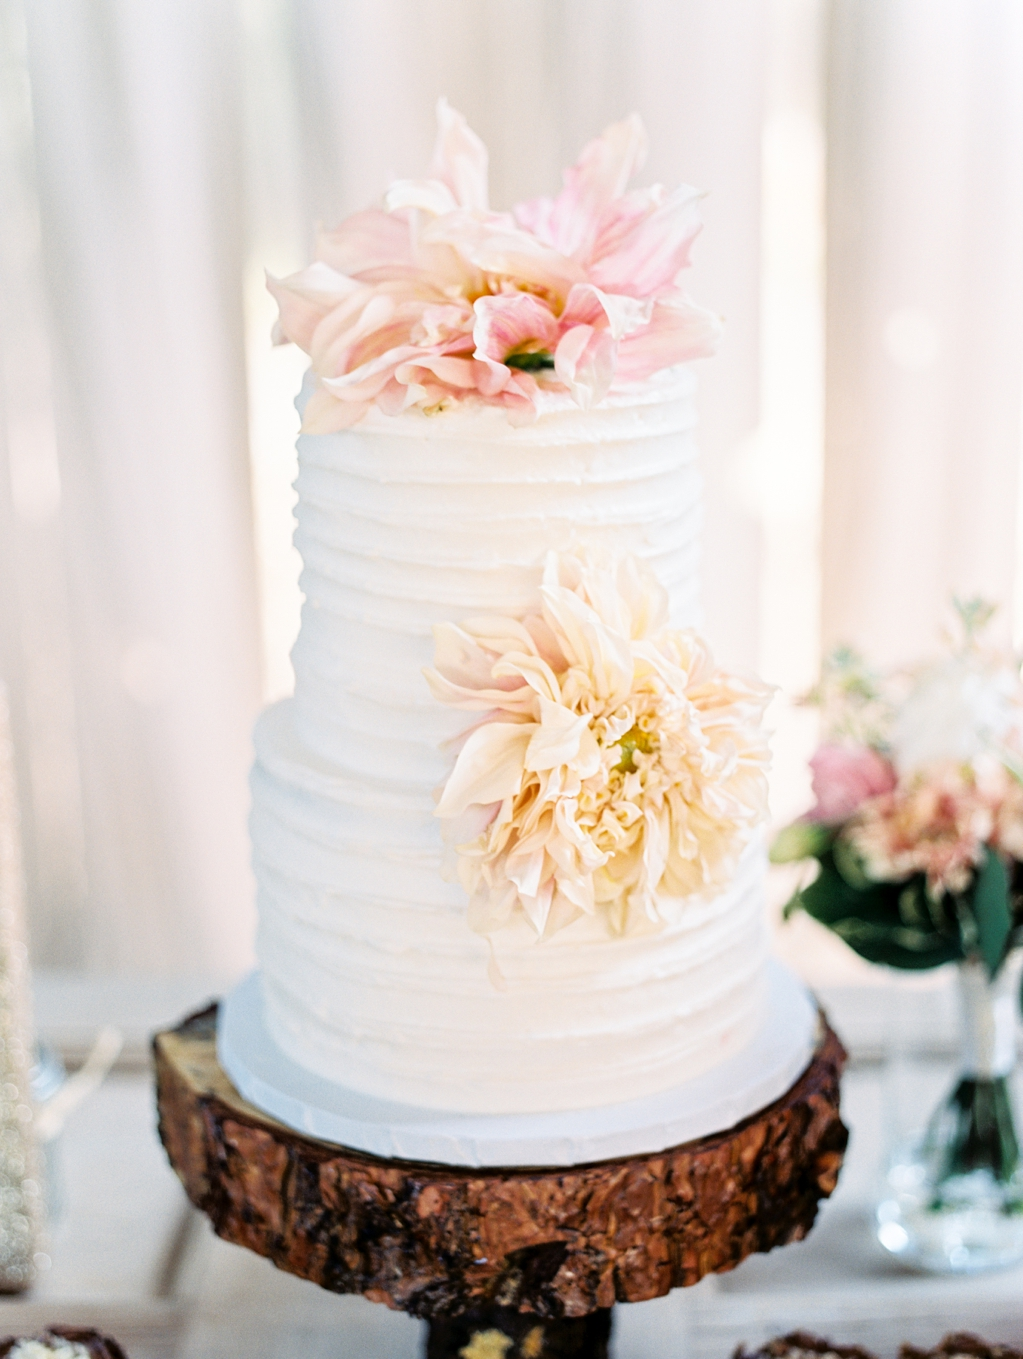 santa-ynez-wedding-mike-thezier-photography_0047.jpg